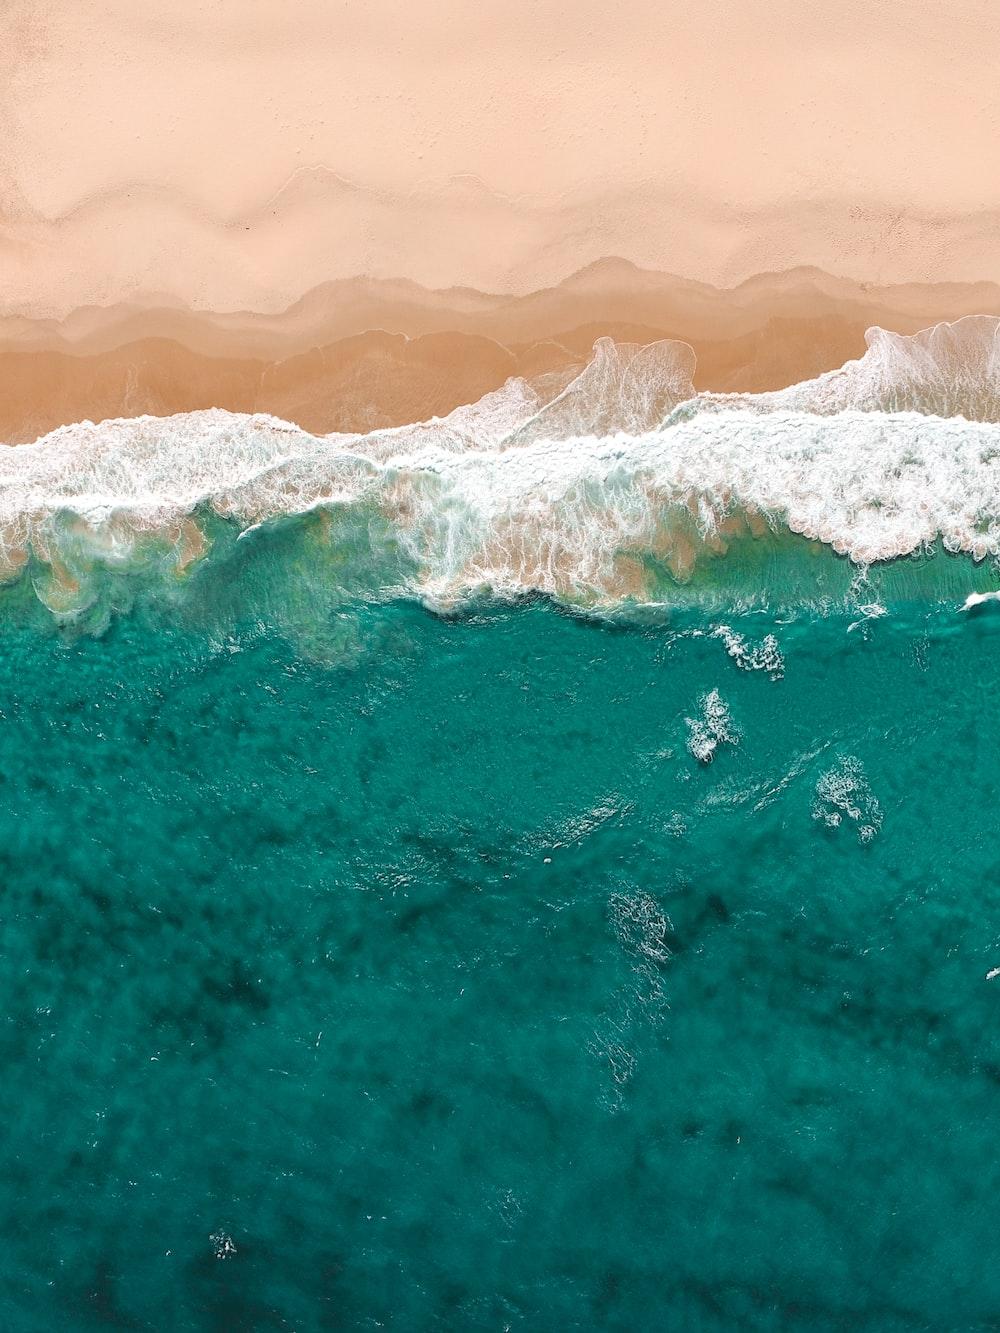 Iphone Wallpaper Photo Free Ocean Image On Unsplash